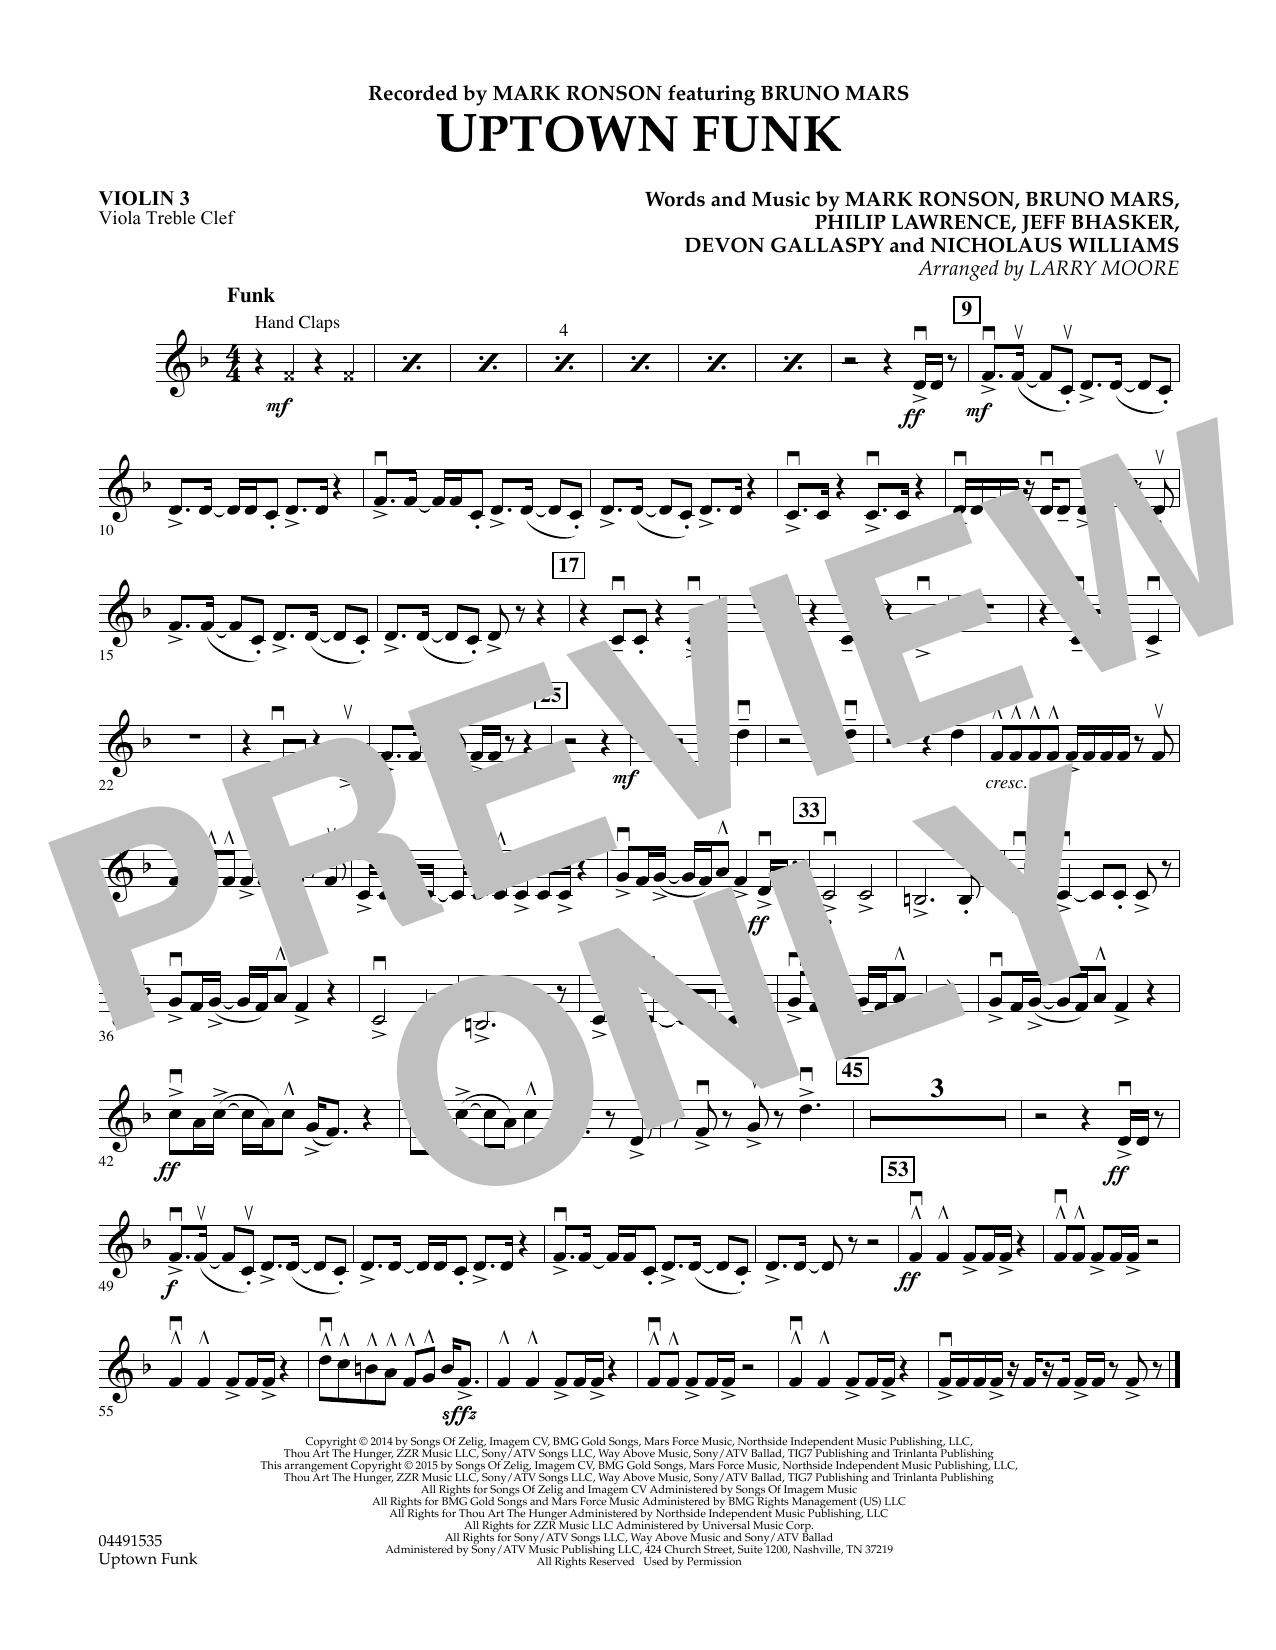 Uptown Funk - Violin 3 (Viola Treble Clef) (Orchestra)